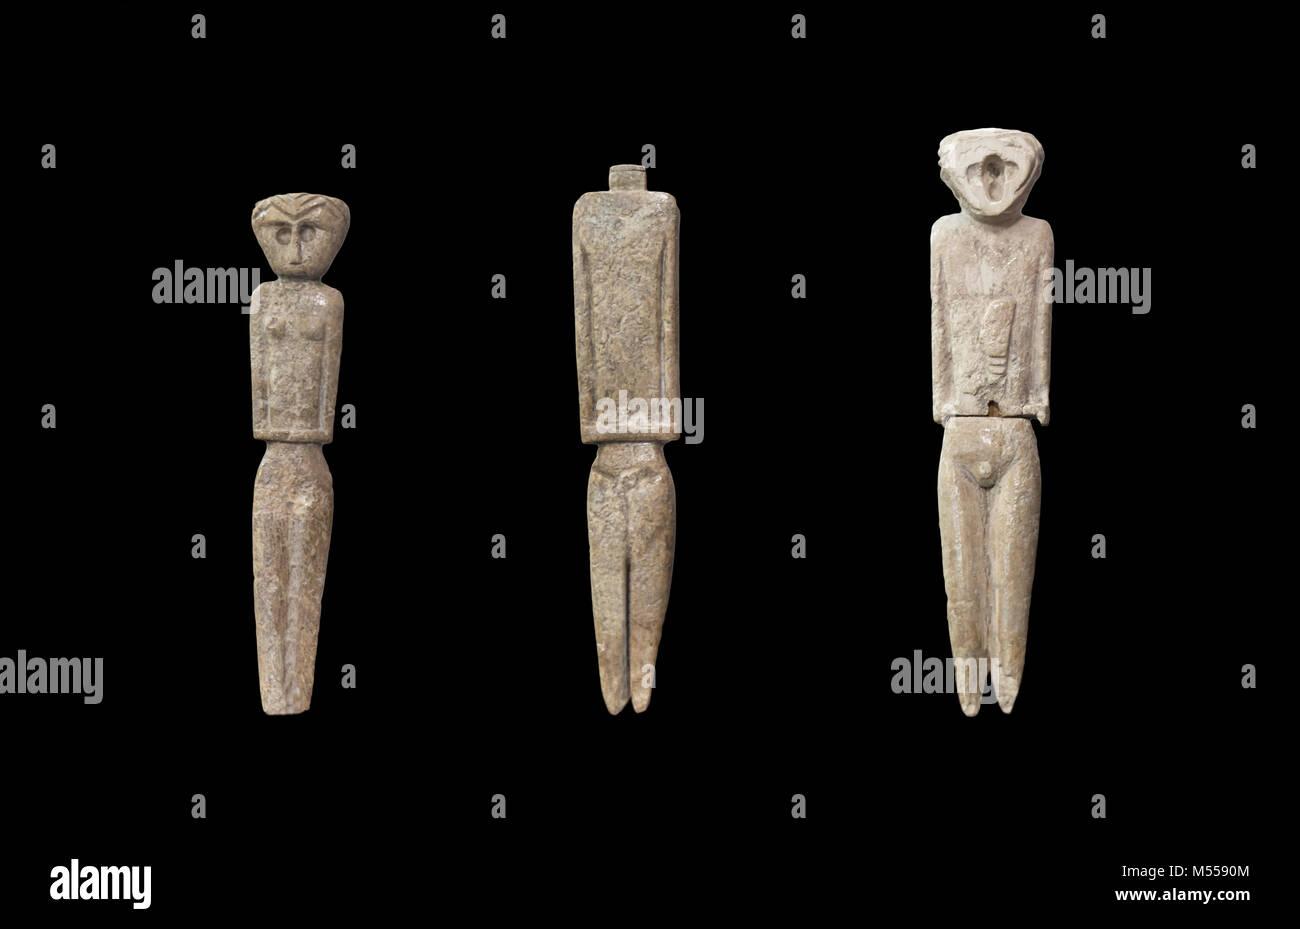 Jaen, Spain - December 29th, 2017: Anthropomorphous idols of Marroquies Bajos site. Representation of deities made - Stock Image